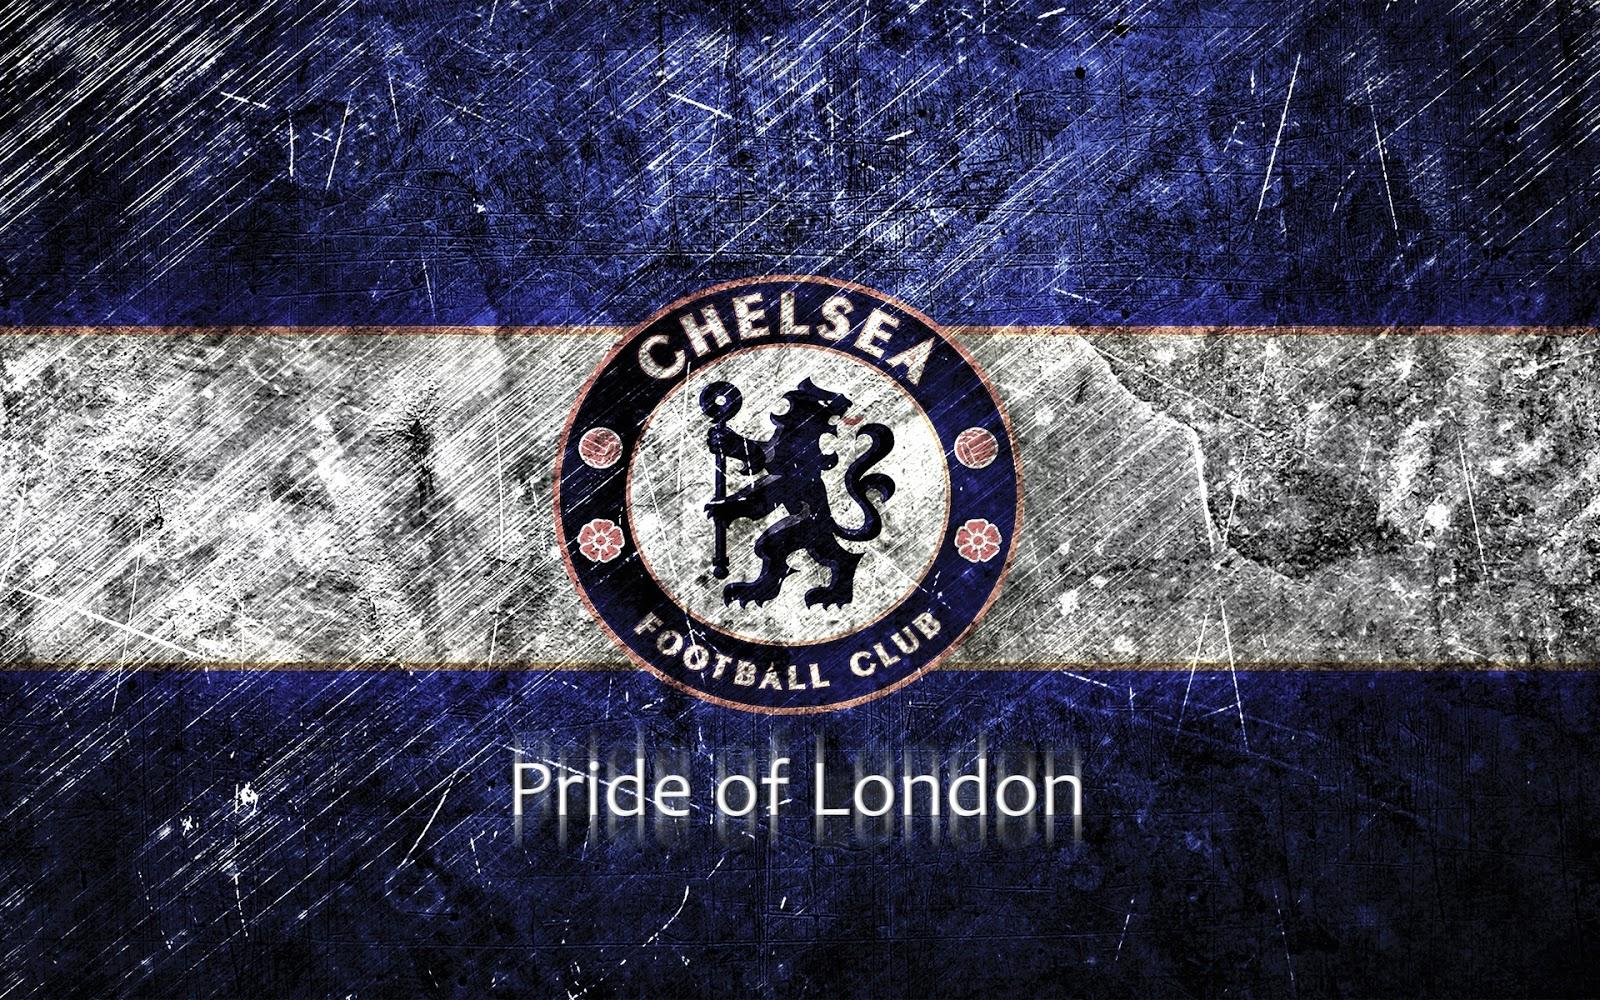 Chelsea 2015 2016 Priority Season Purchase